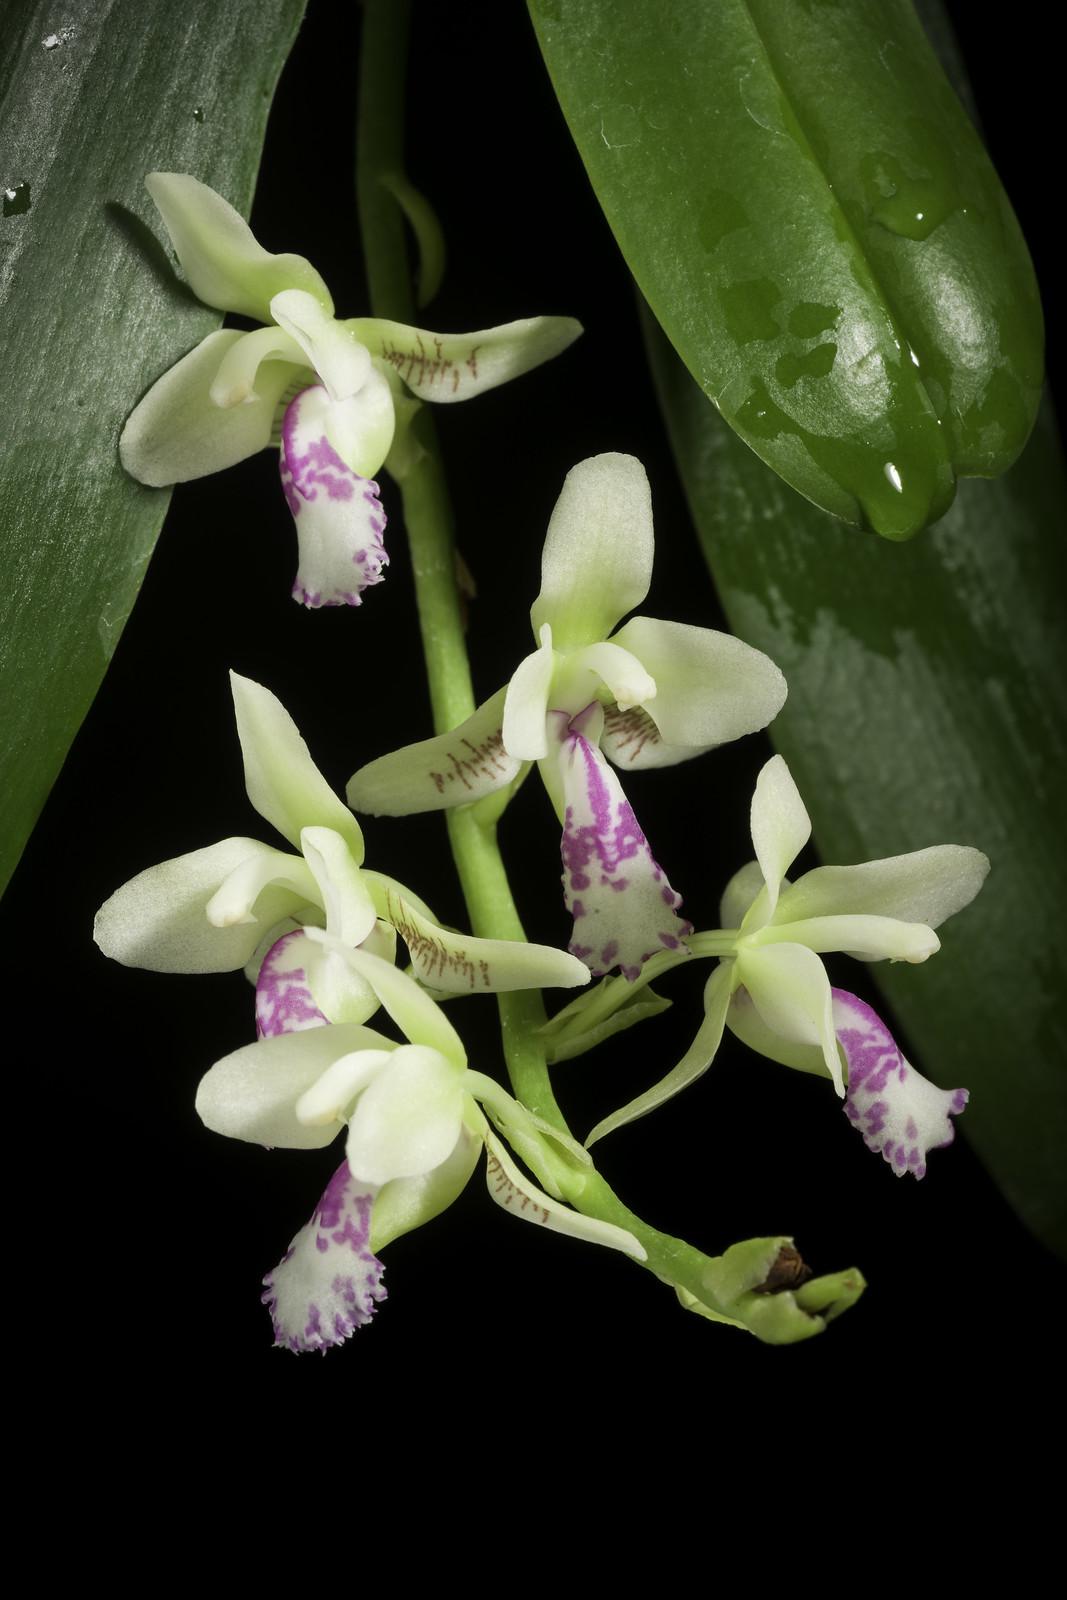 Phalaenopsis japonica '#2003' (Rchb.f.) Kocyan & Schuit., Phytotaxa 161: 67 (2014)